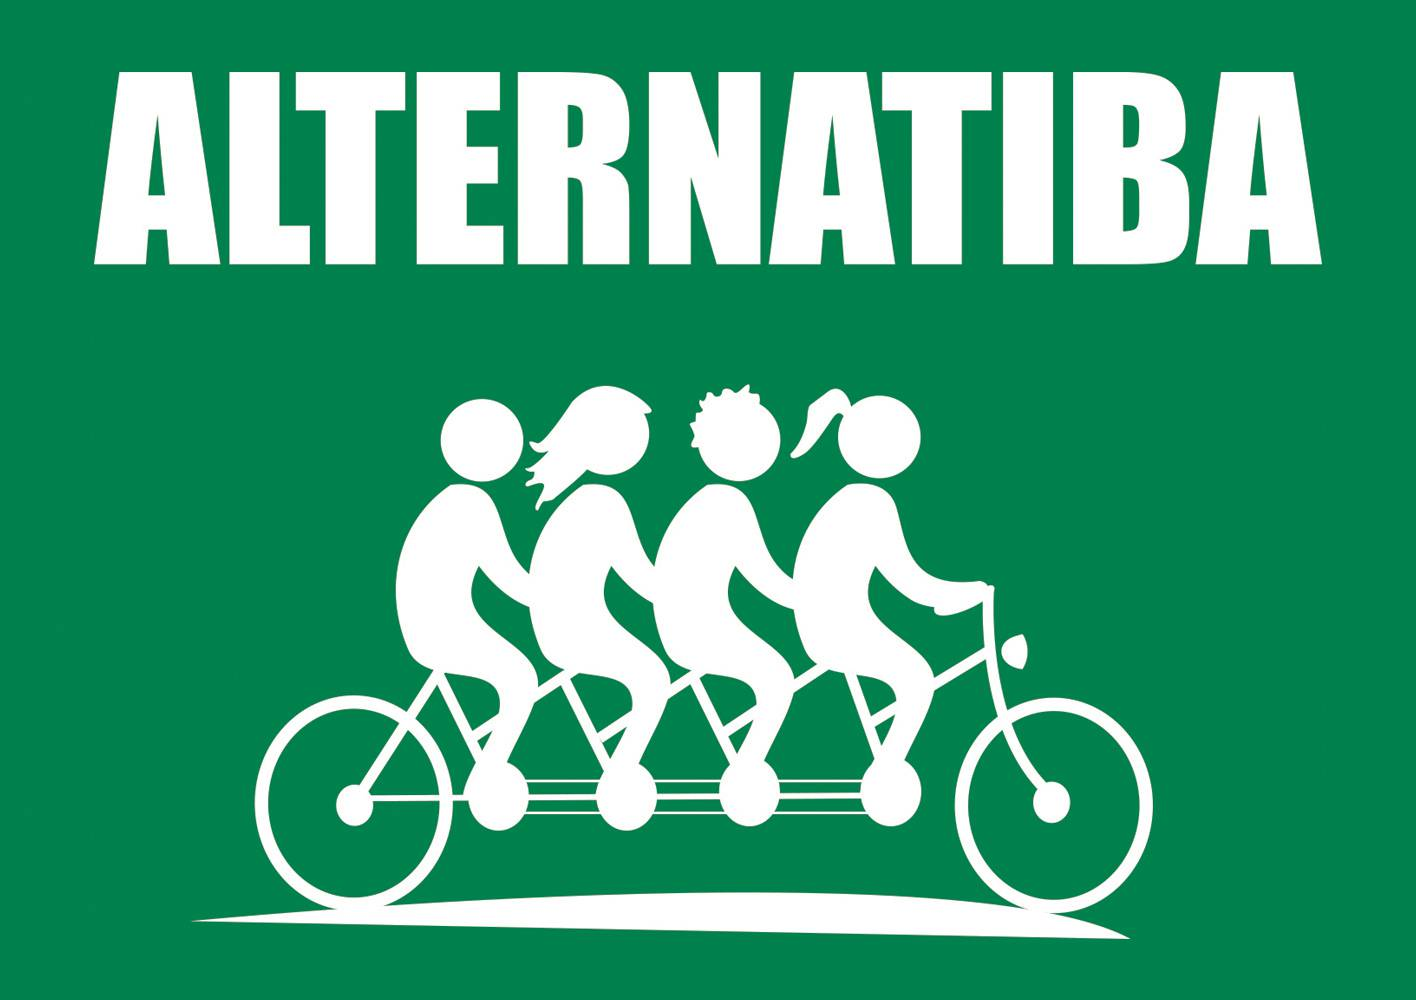 logoAlternatibablanc